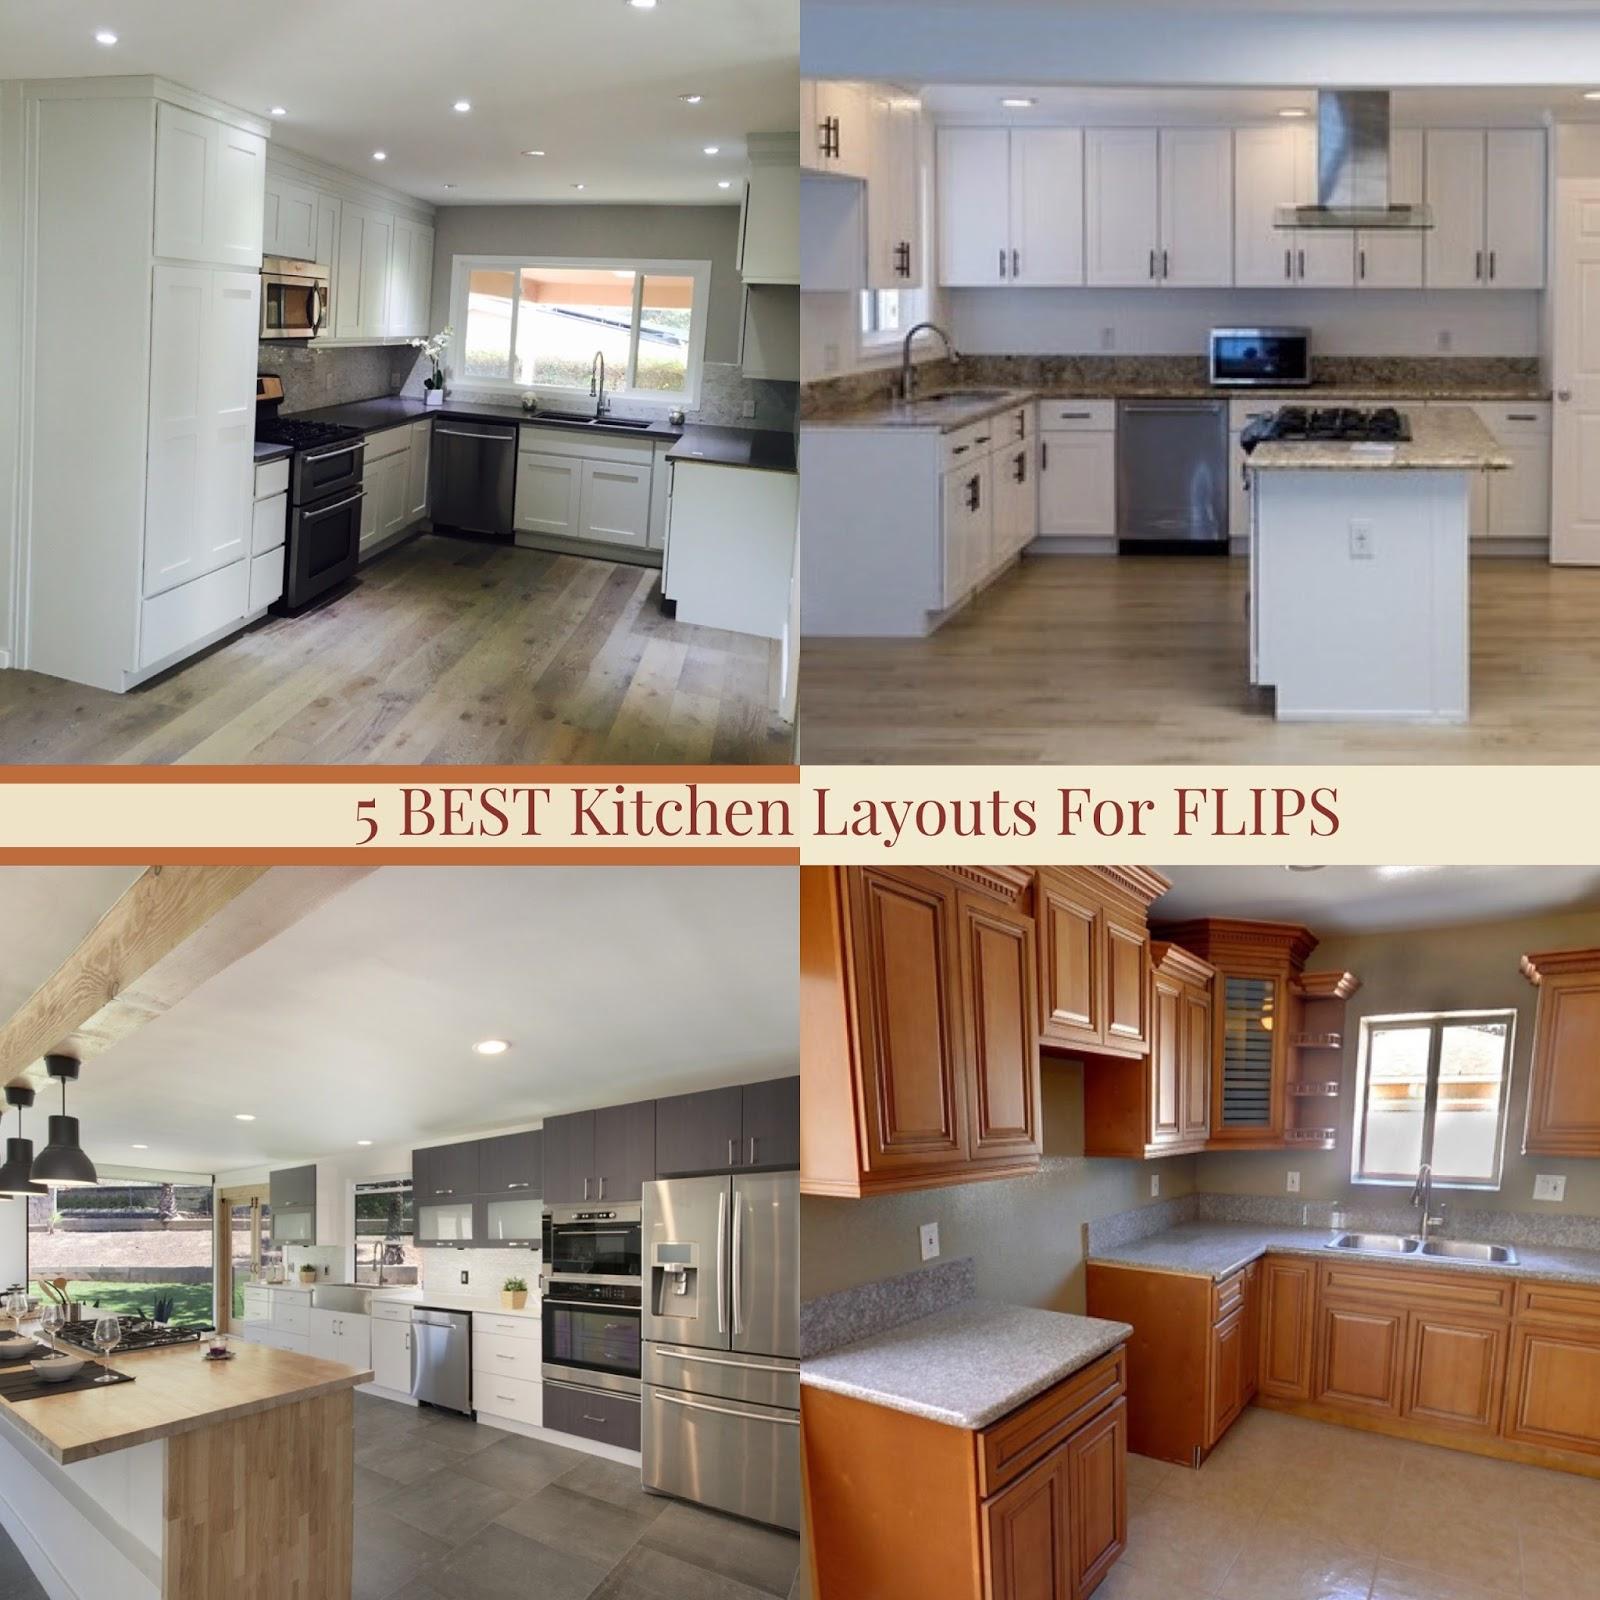 Kitchen Renovation Dos And Don Ts: Kitchen Remodel Do's & Don'ts